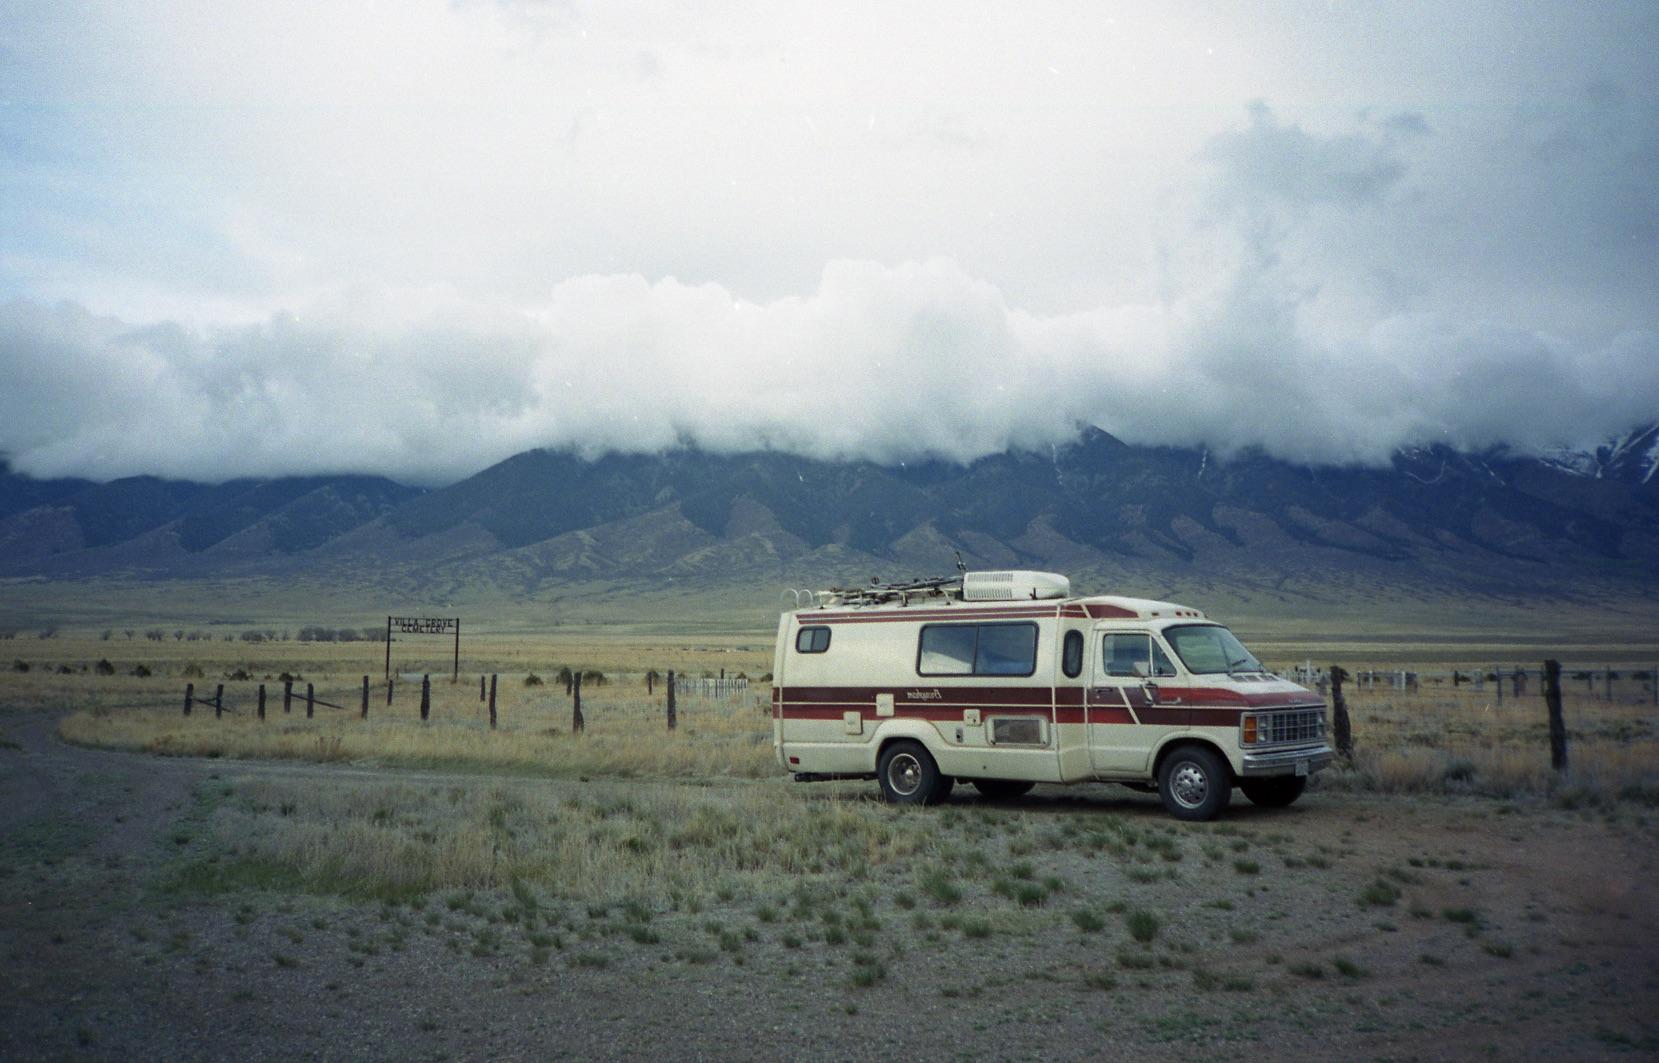 The Maloney van.